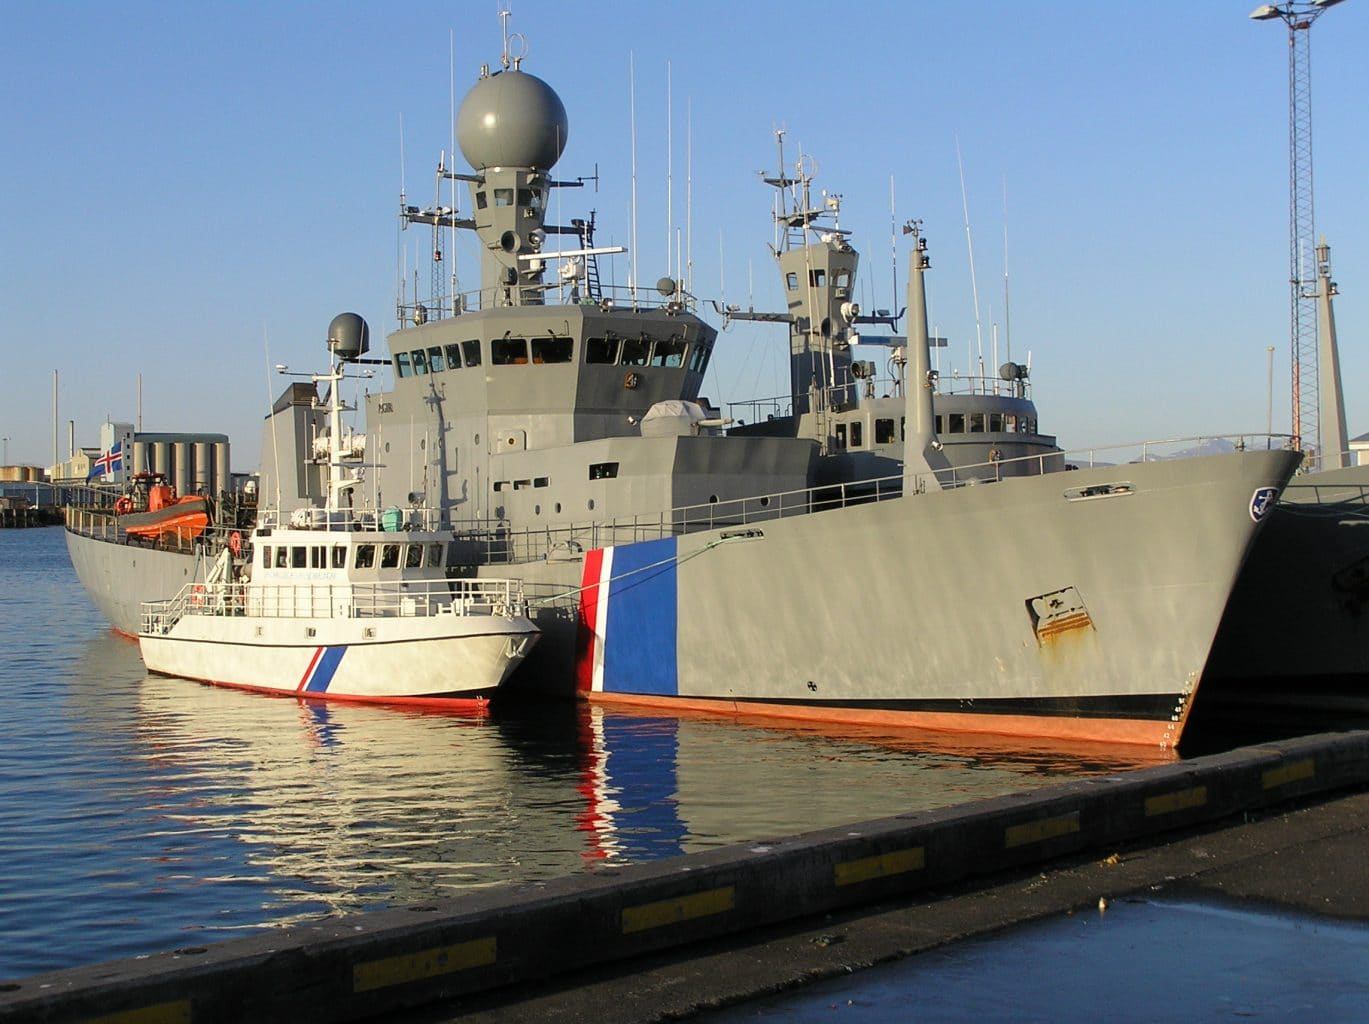 Icelandic Coast Guard Patrols